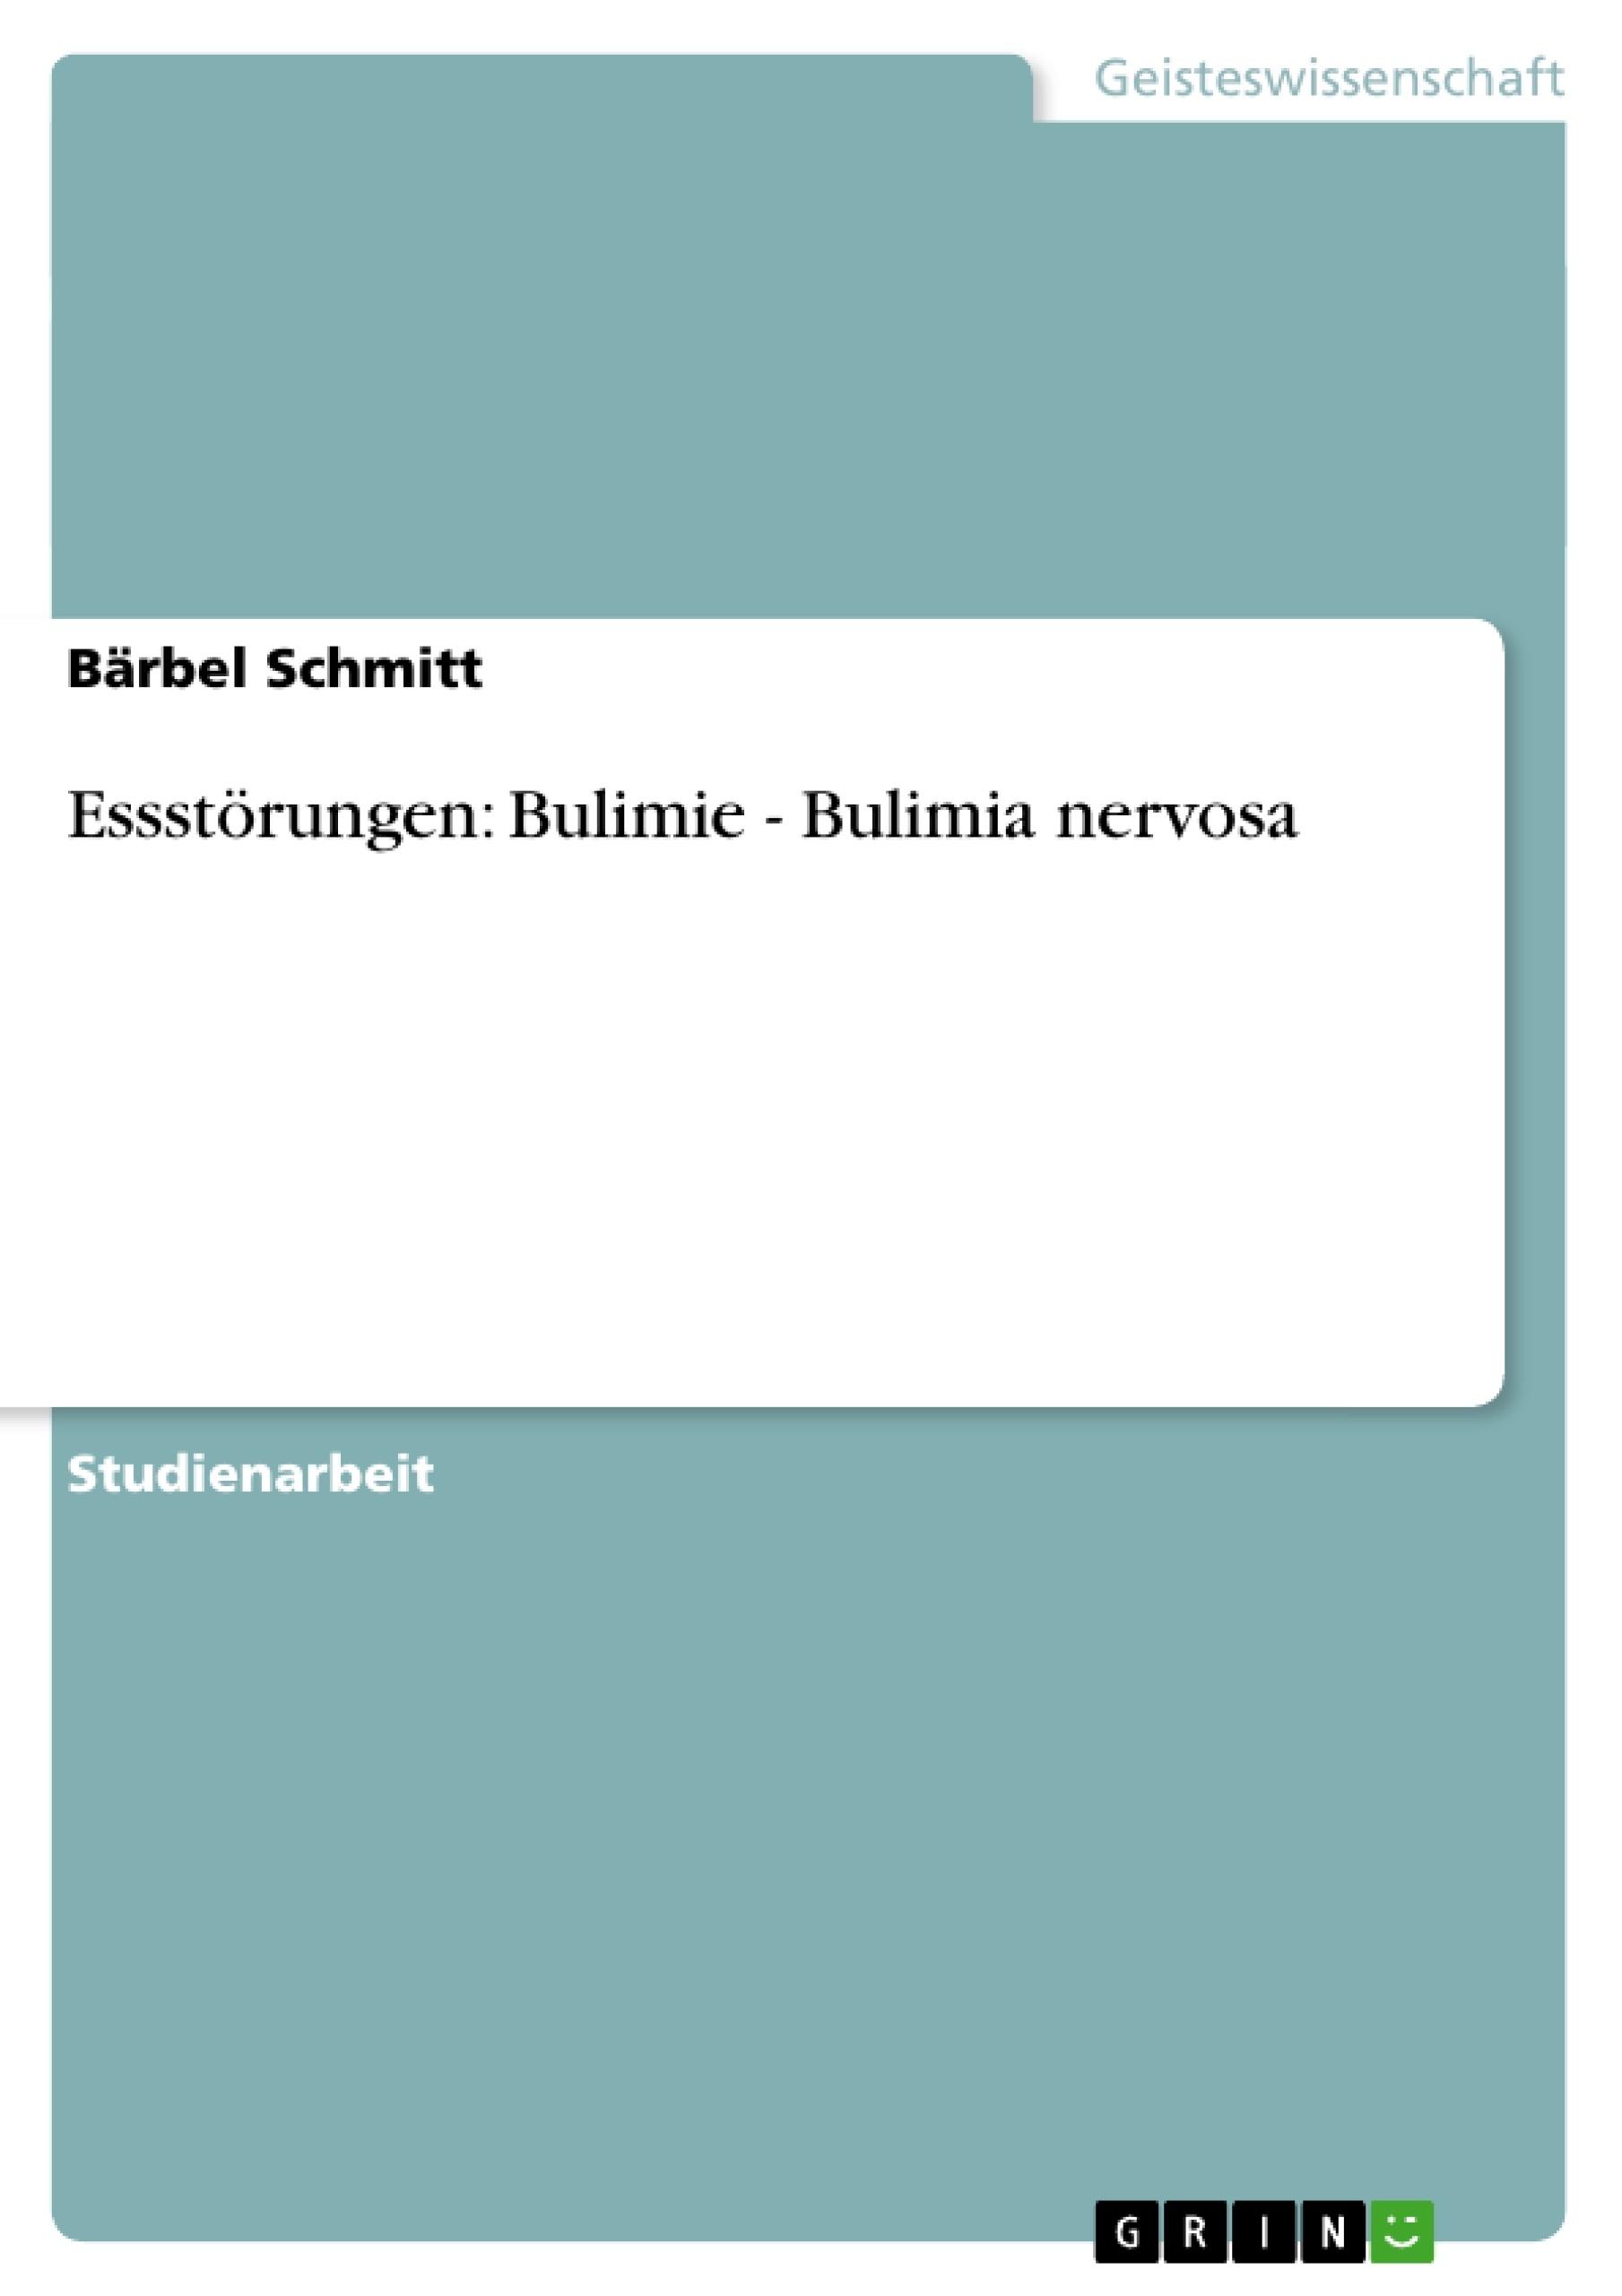 Titel: Essstörungen: Bulimie - Bulimia nervosa